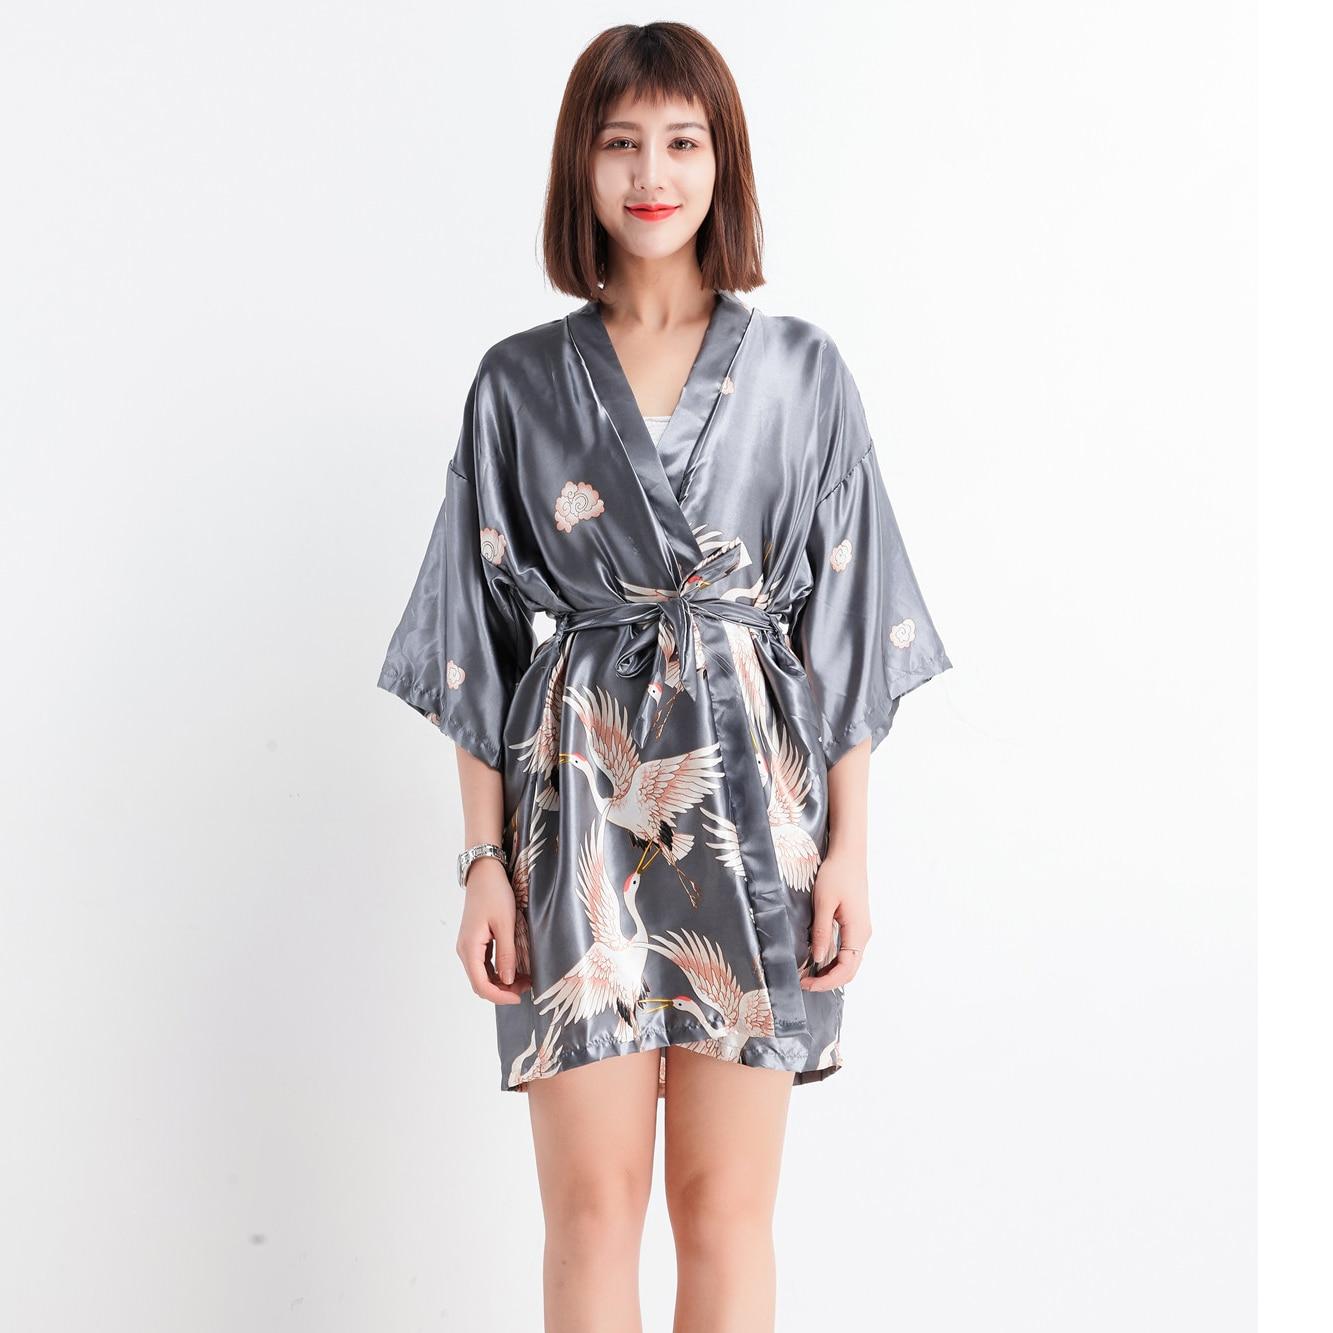 b7a206b8a0 2018-Summer-Women -Gray-Sleepwear-Elegant-Rayon-Nightgown-Wedding-Robe-Nightwear-Lady-Spa-Nightdress-Lounge-Kimono.jpg